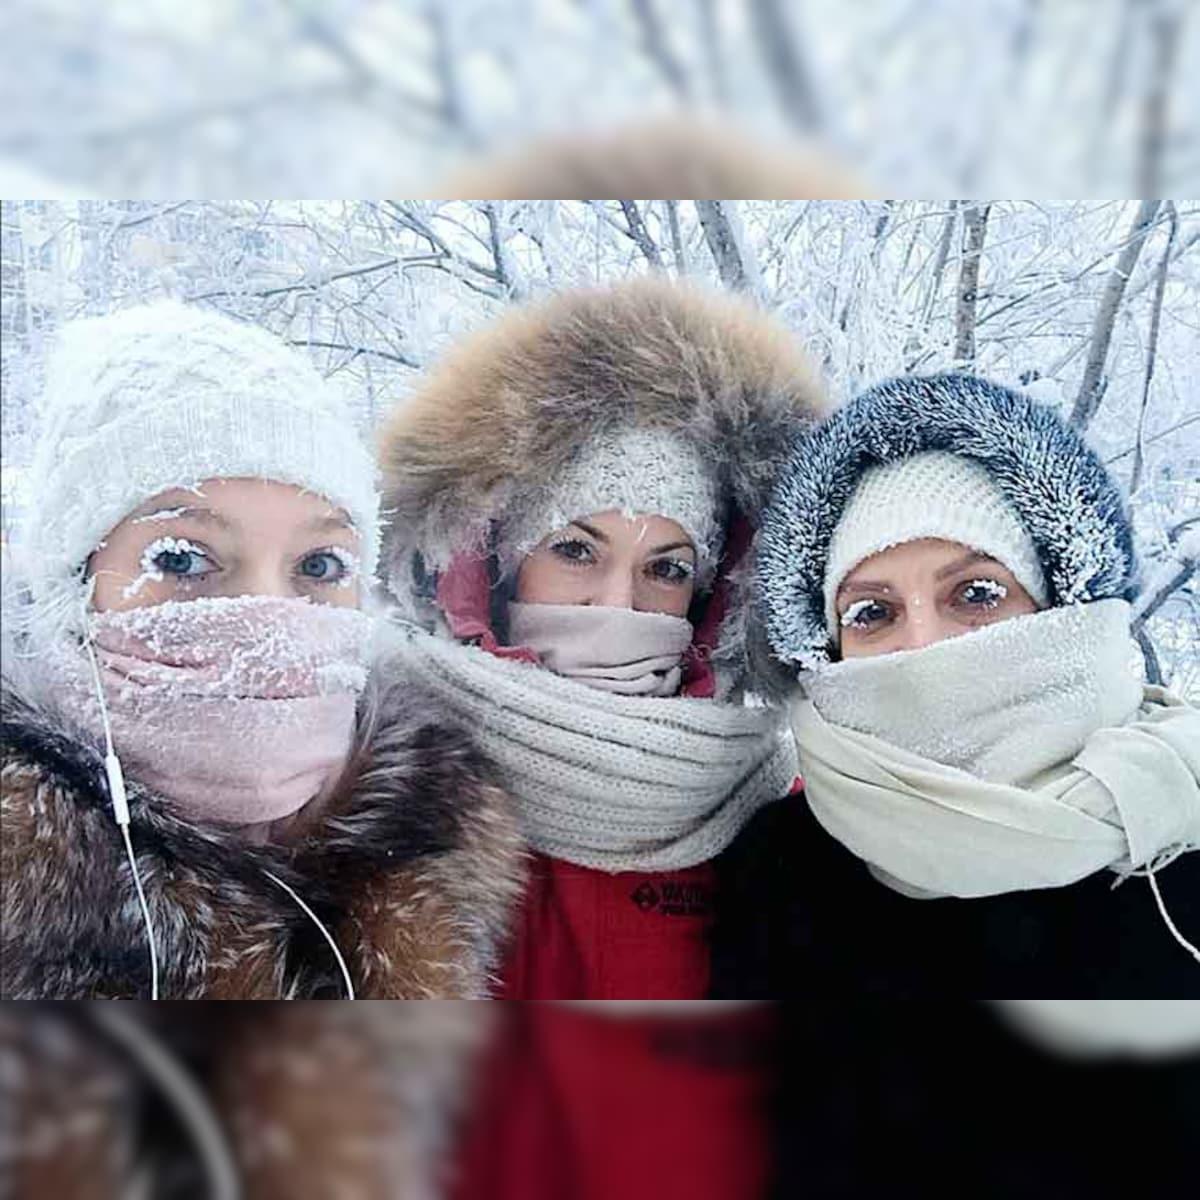 Even Eyelashes Freeze: Russia's Oymyakon Sees Minus 67 Degrees Celsius